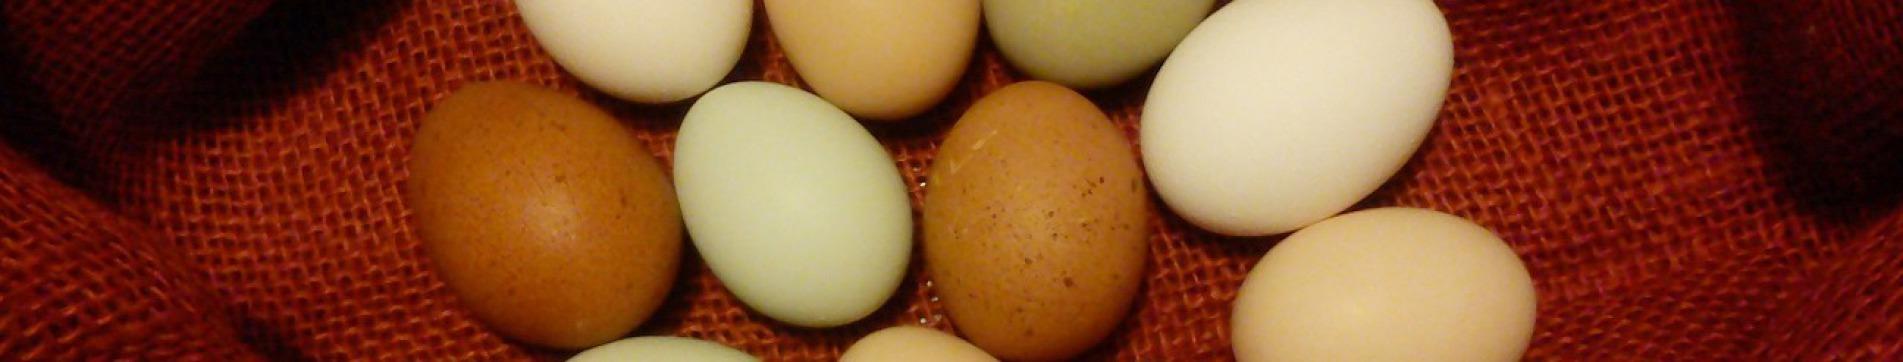 Huehnerhof Juesven - Hühnervideos